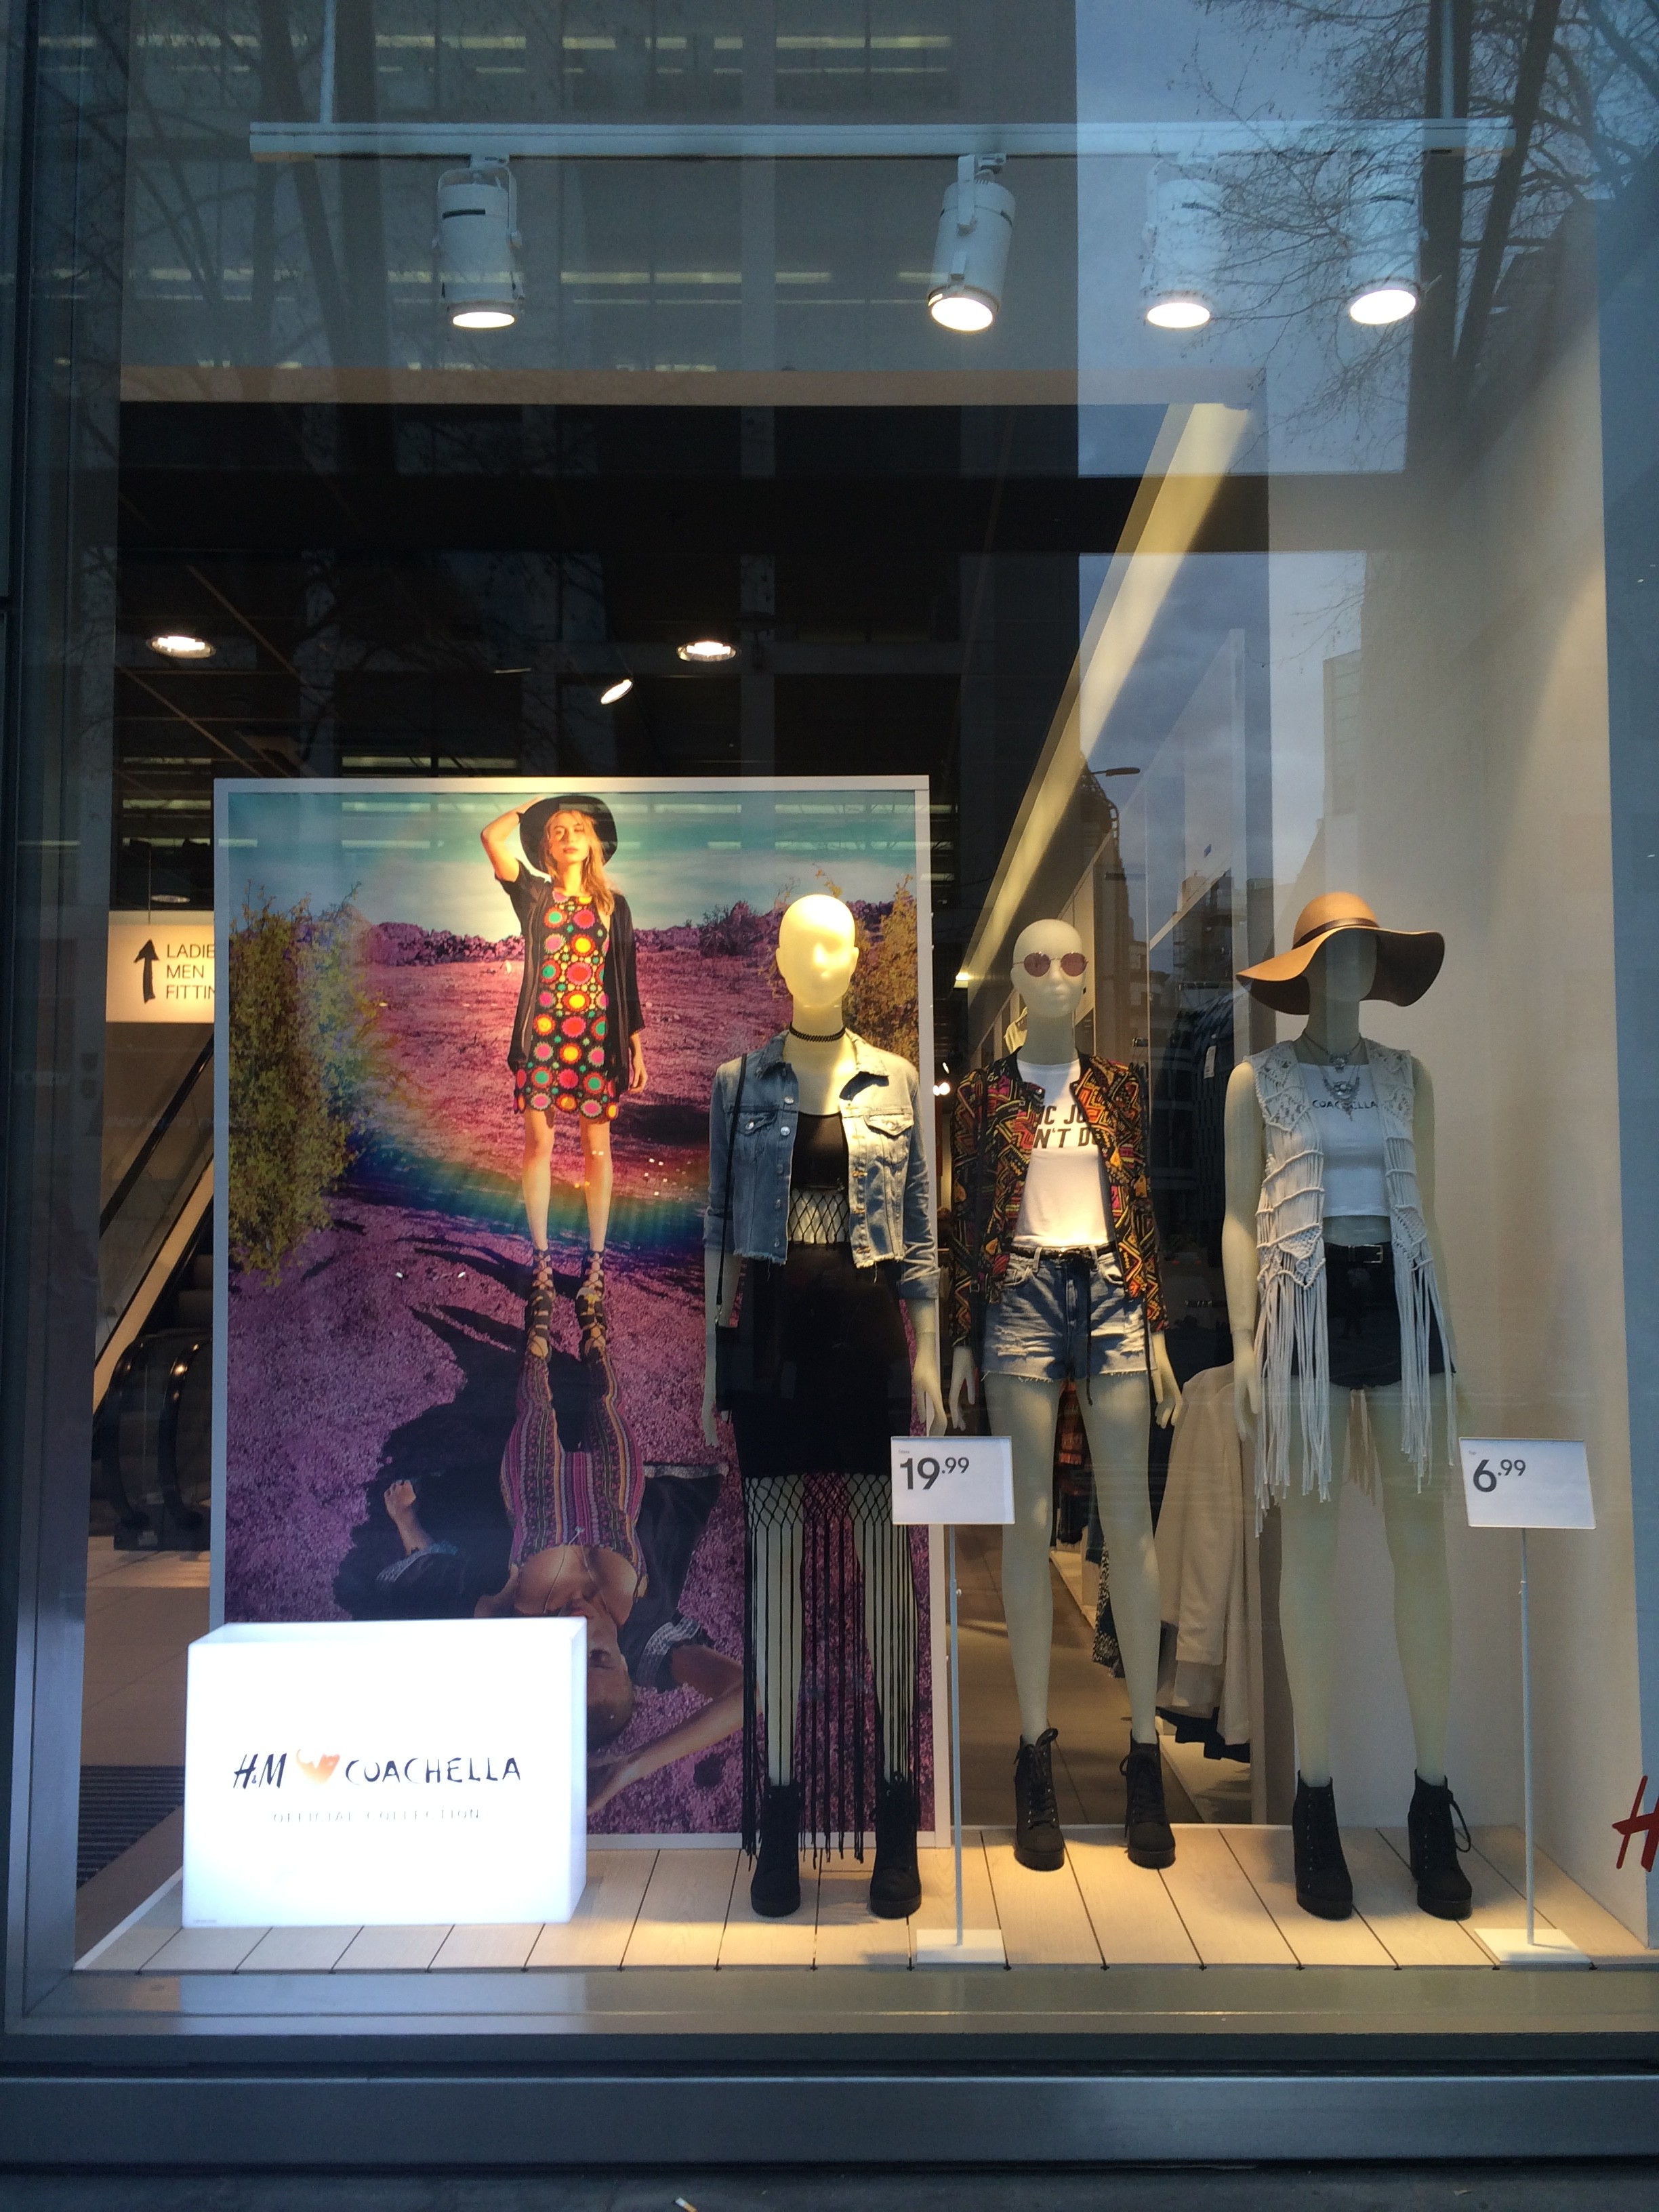 Coachella fashion at H&M